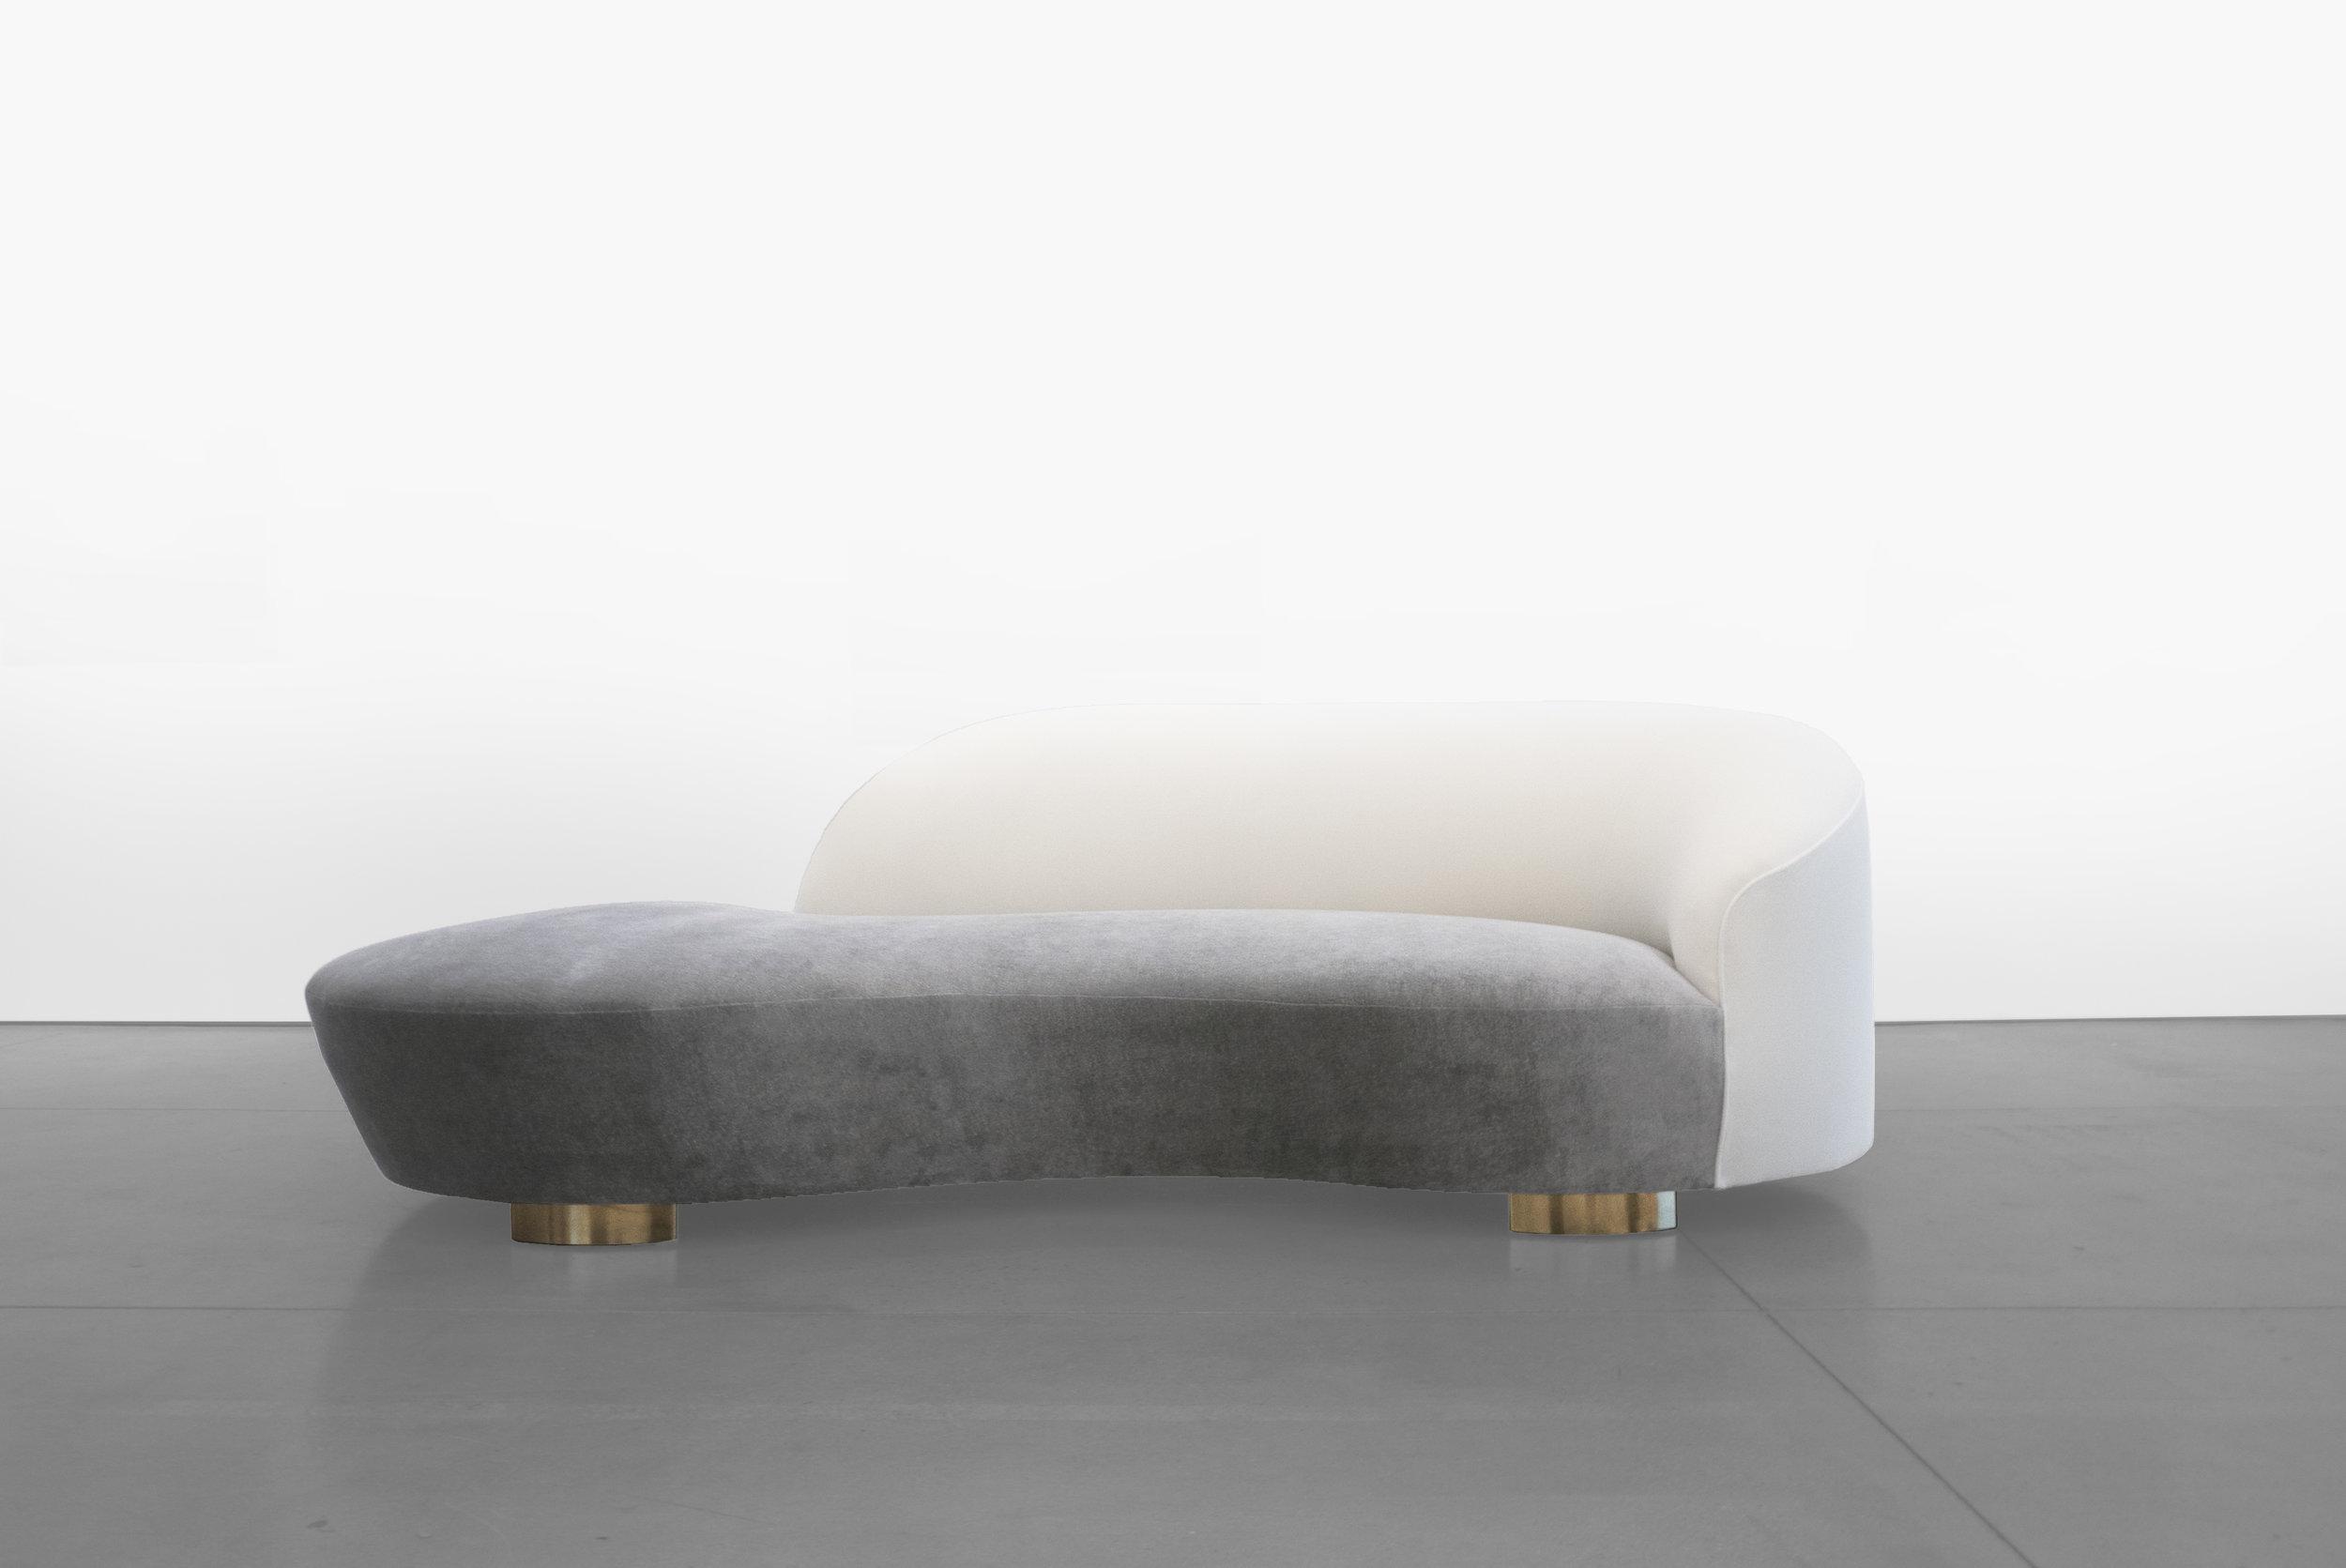 Vladimir Kagan, 'Cloud' Sofa, c. 1970 - 1979, Wood, Dedar Milano Upholstery, 32.5 H x 98 W x 16 D incehs_2.jpg